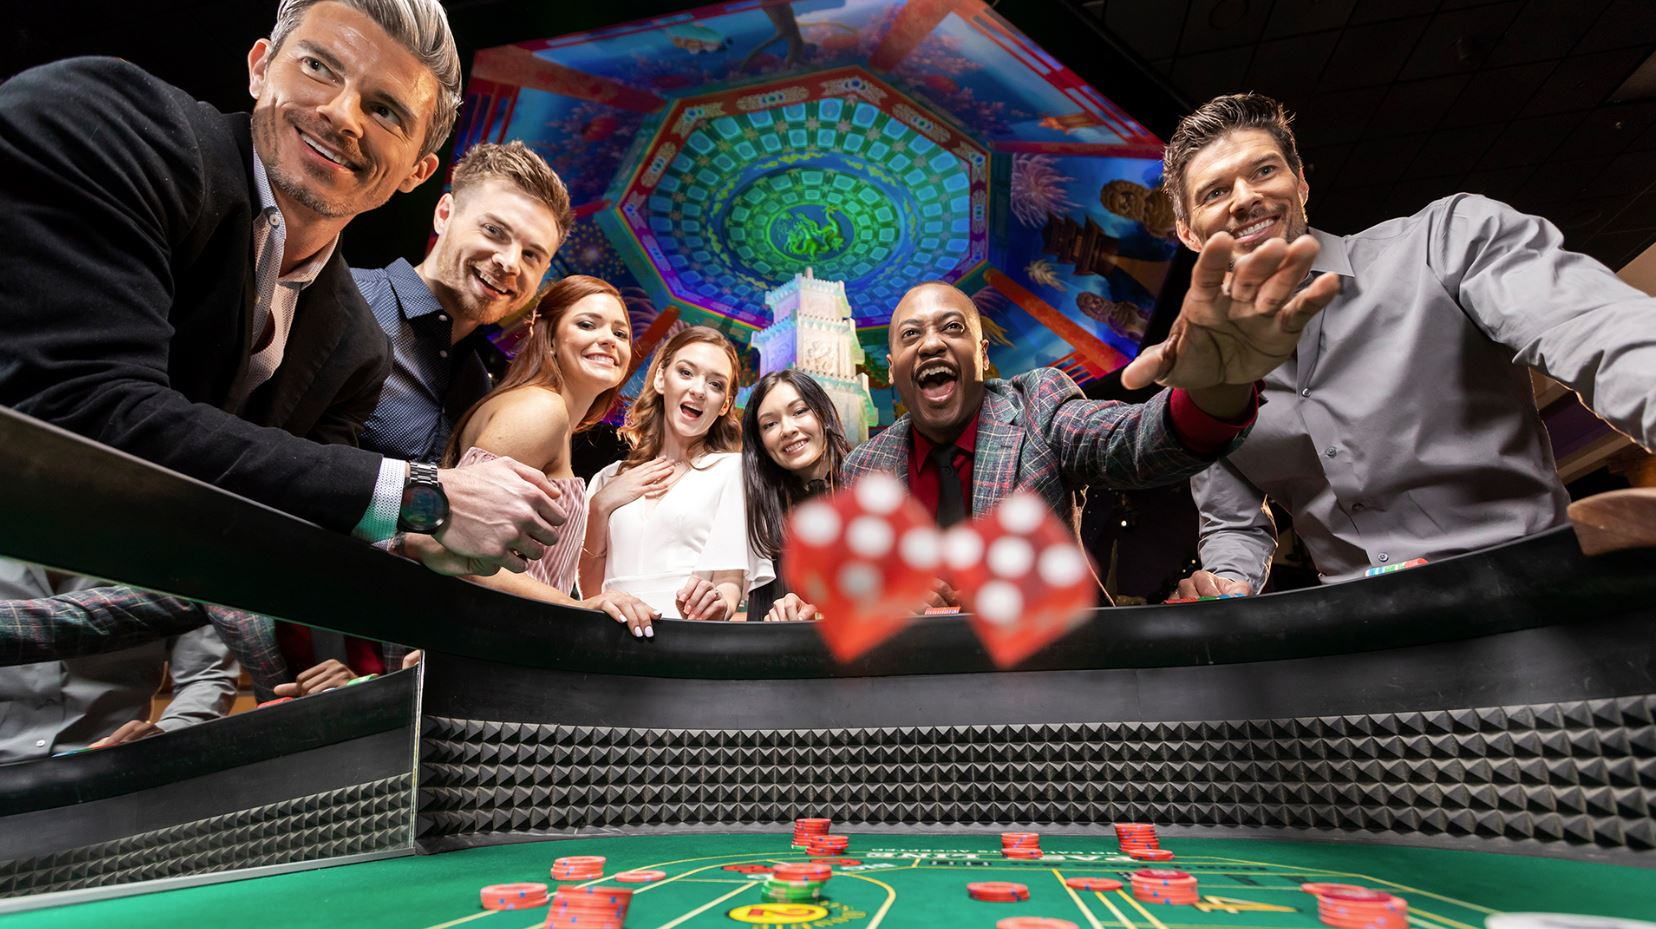 Best casino experience